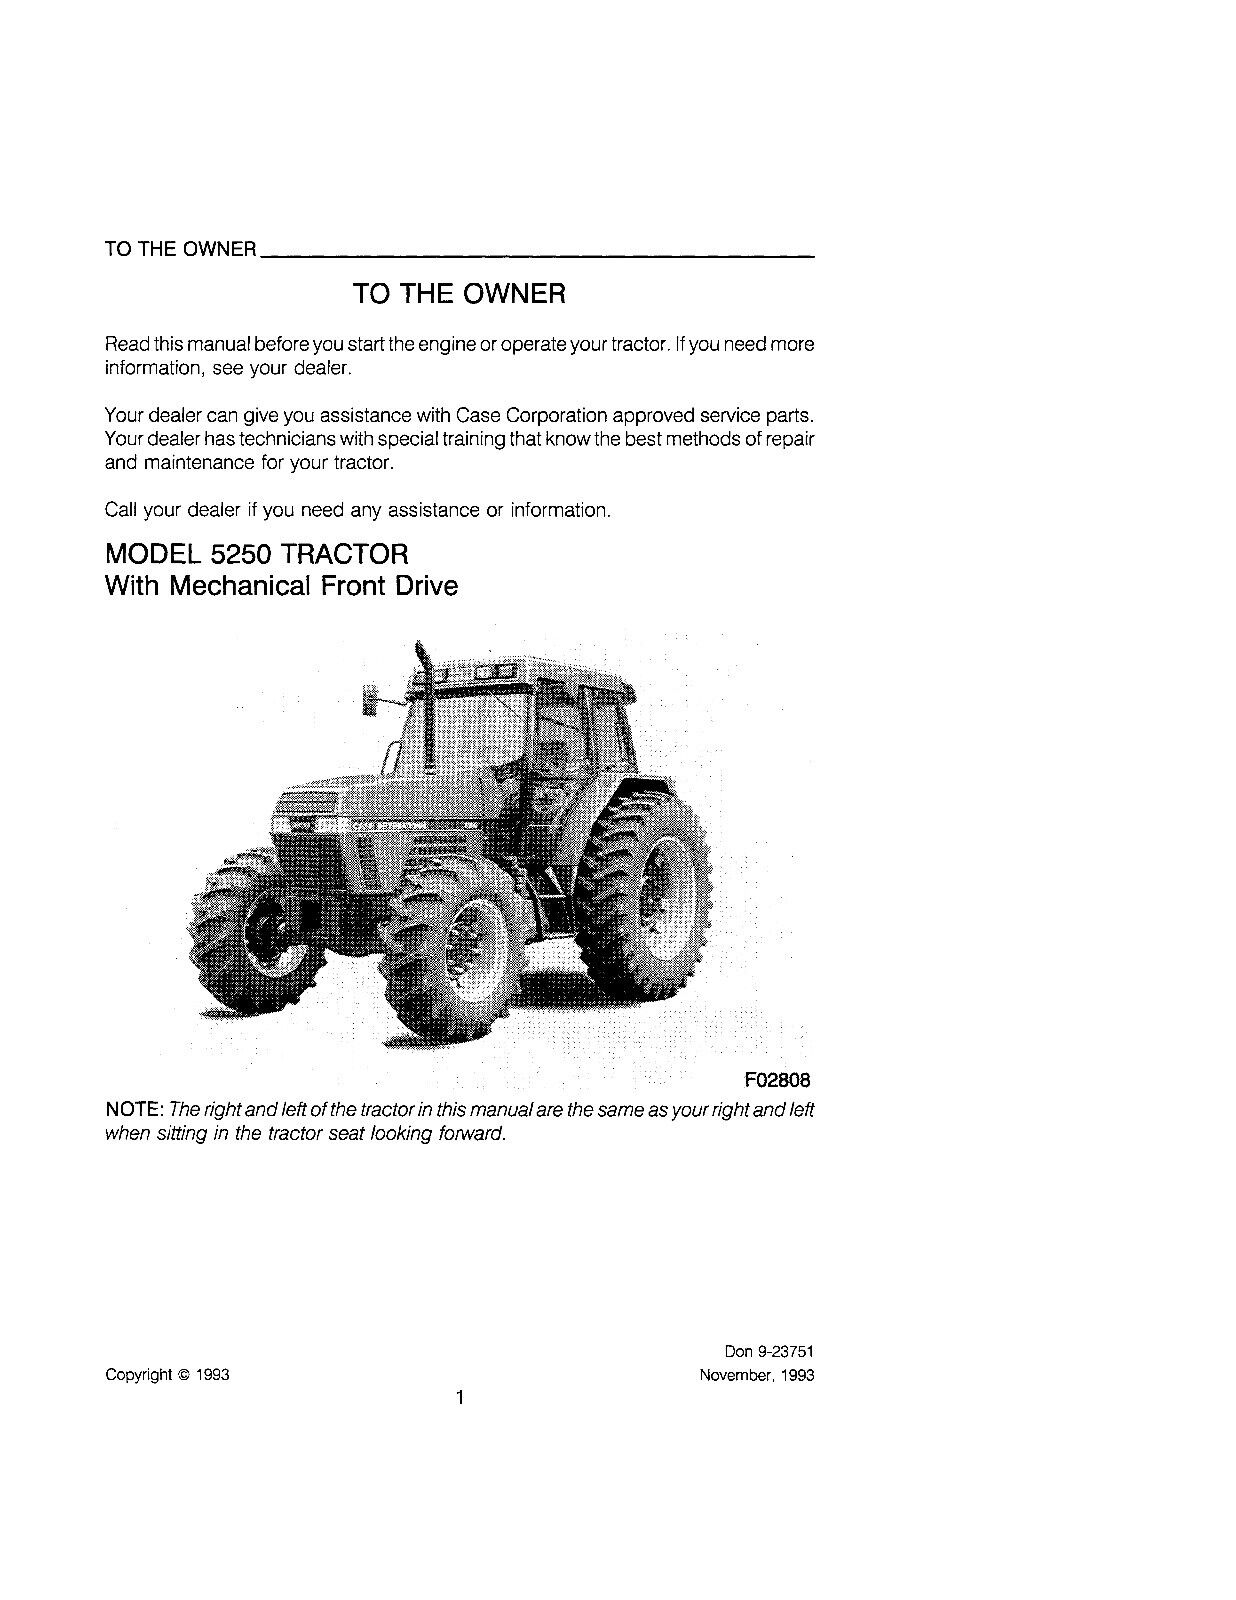 Case Maxxum 5220 5230 5240 5250 Tractor Operators Manual 9-23751 BOOK | eBay